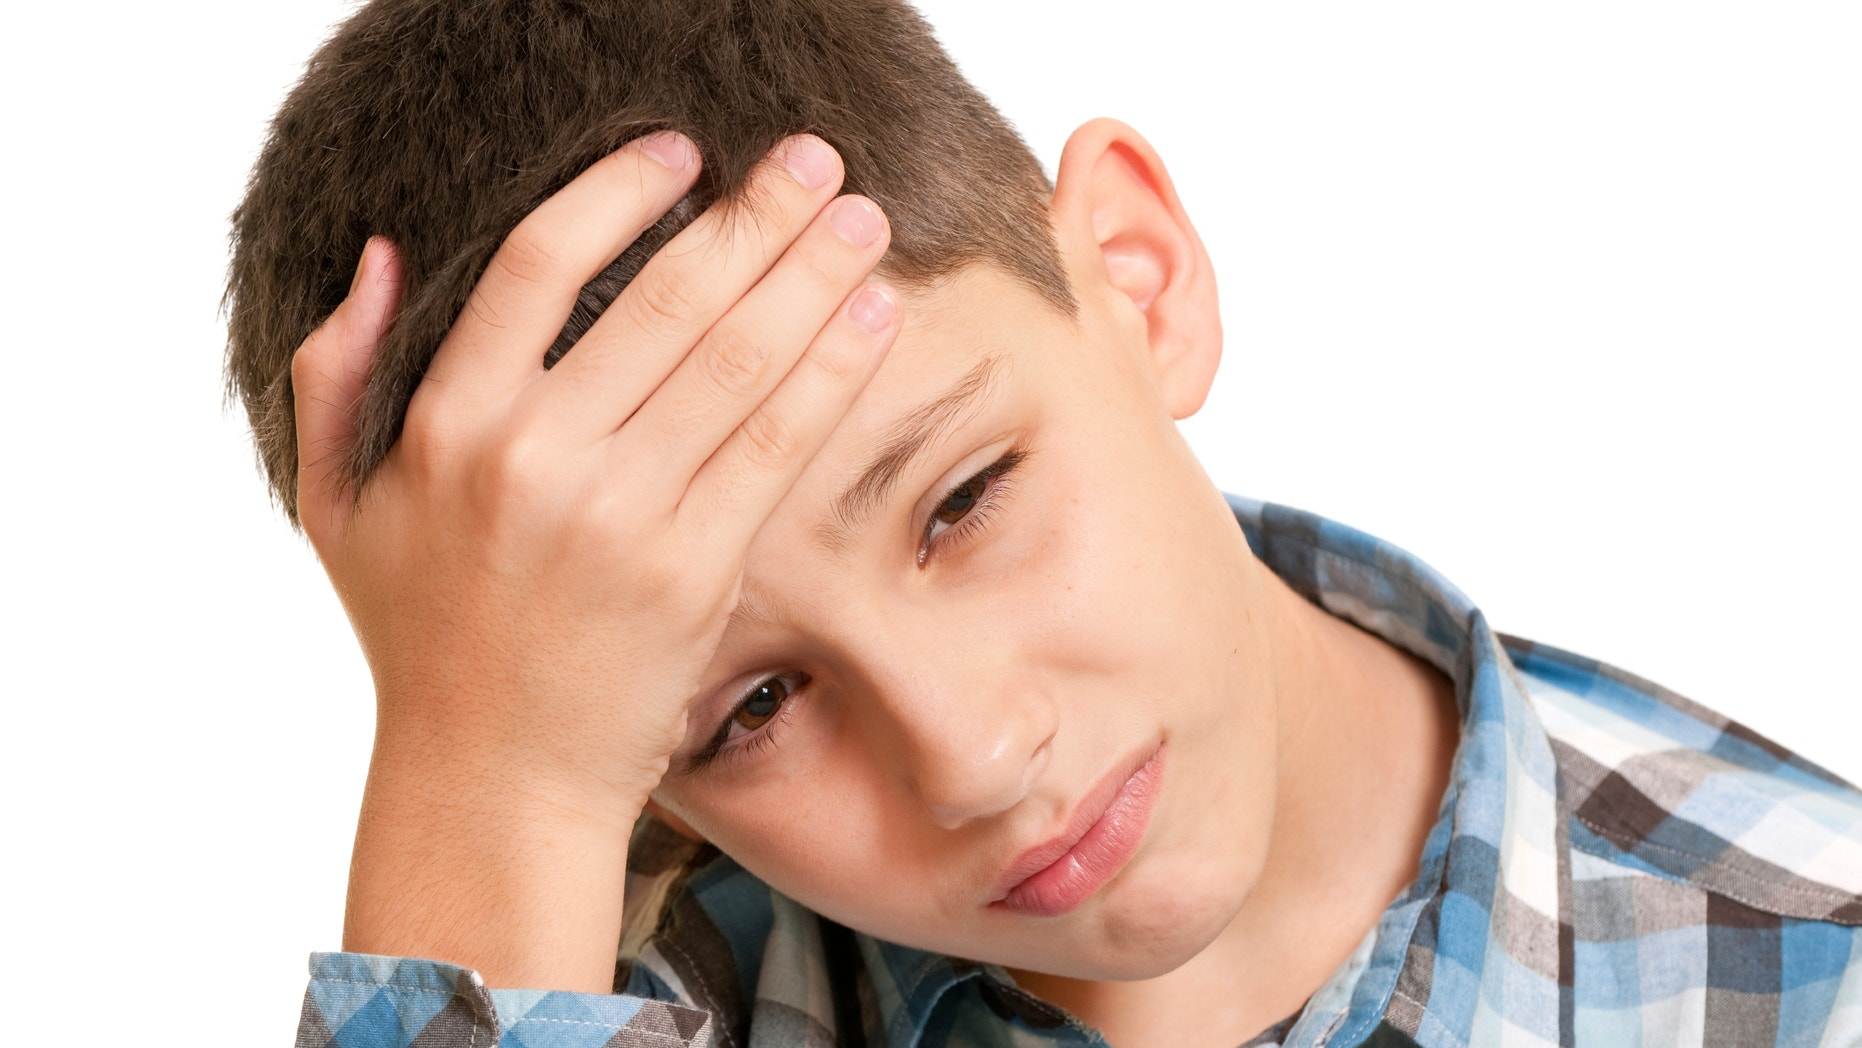 Are headaches taken seriously enough